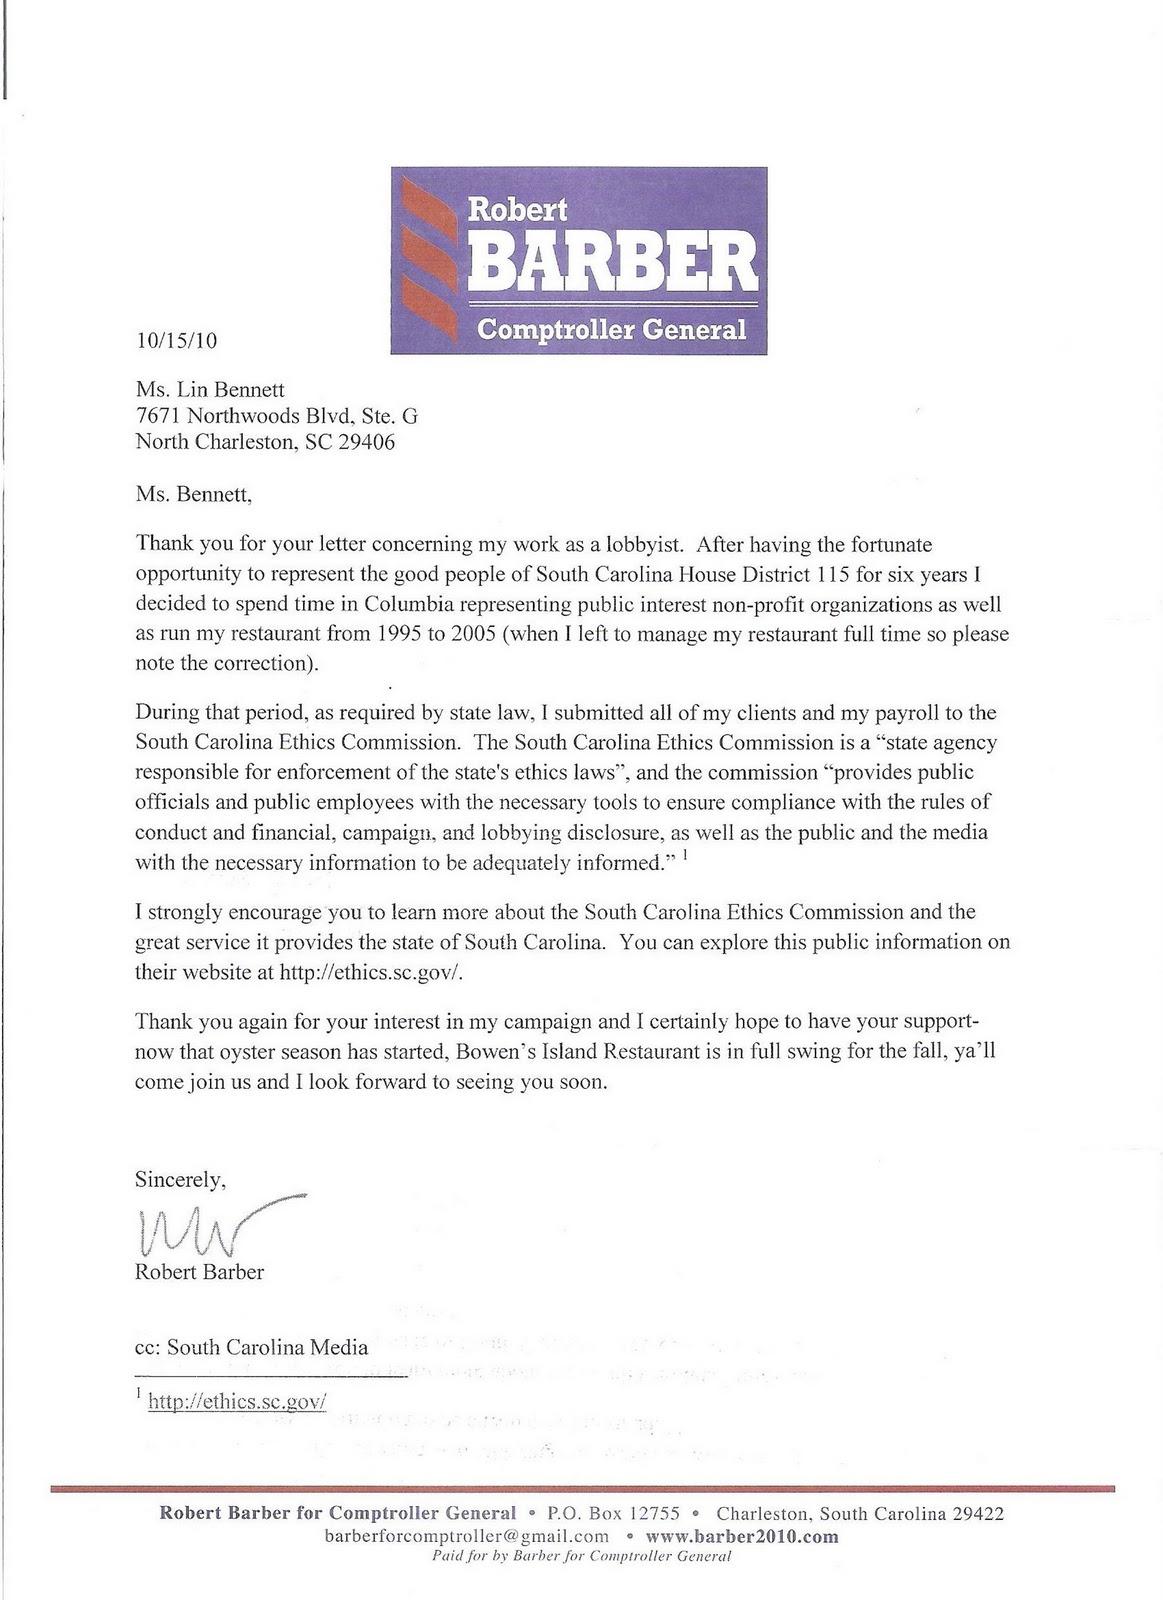 Blogland Of Earl Capps Robert Barber Dodges Lobbying